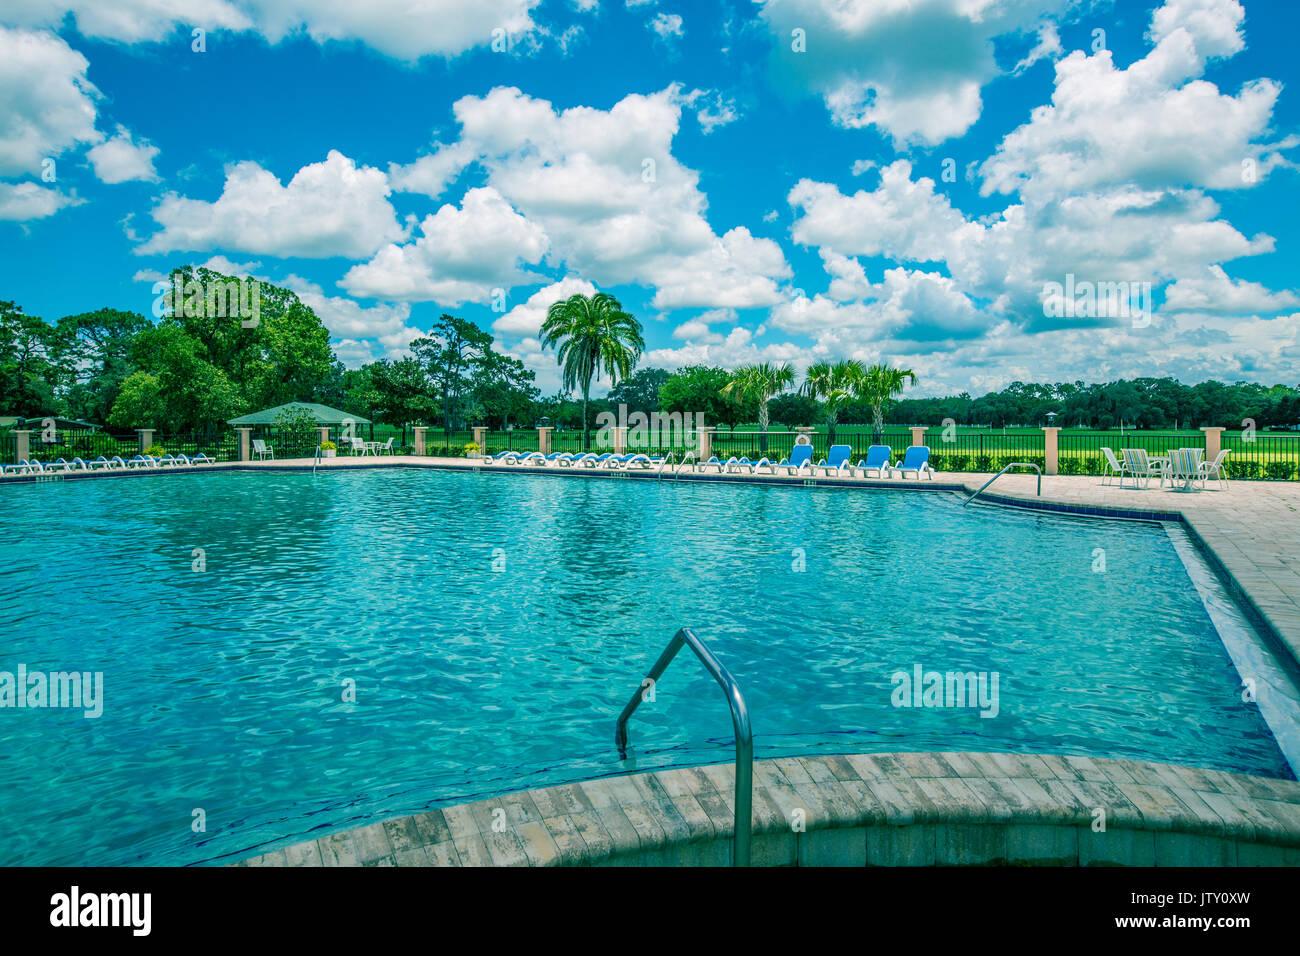 Community Swimming Pool Stock Photos Community Swimming Pool Stock Images Alamy